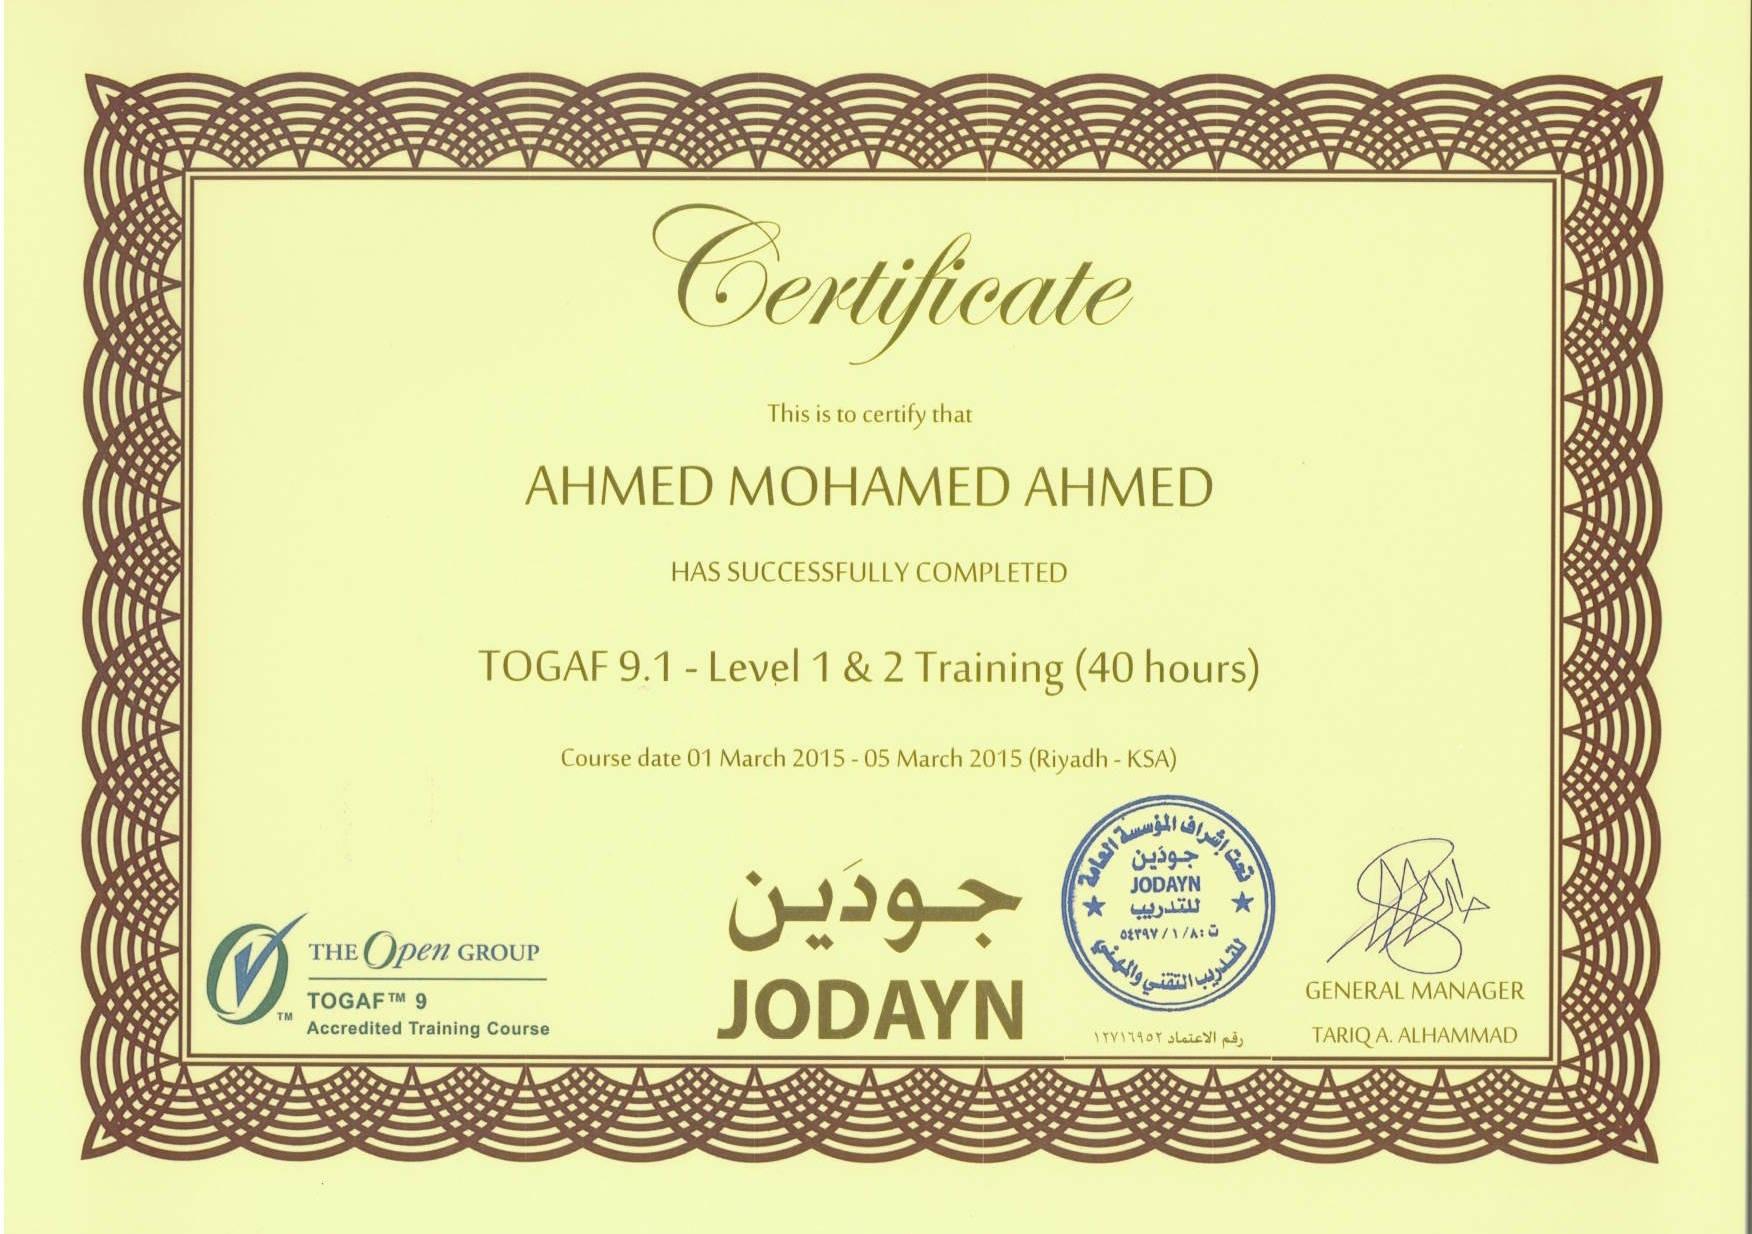 Ahmed Mohamed Ahmed Bayt